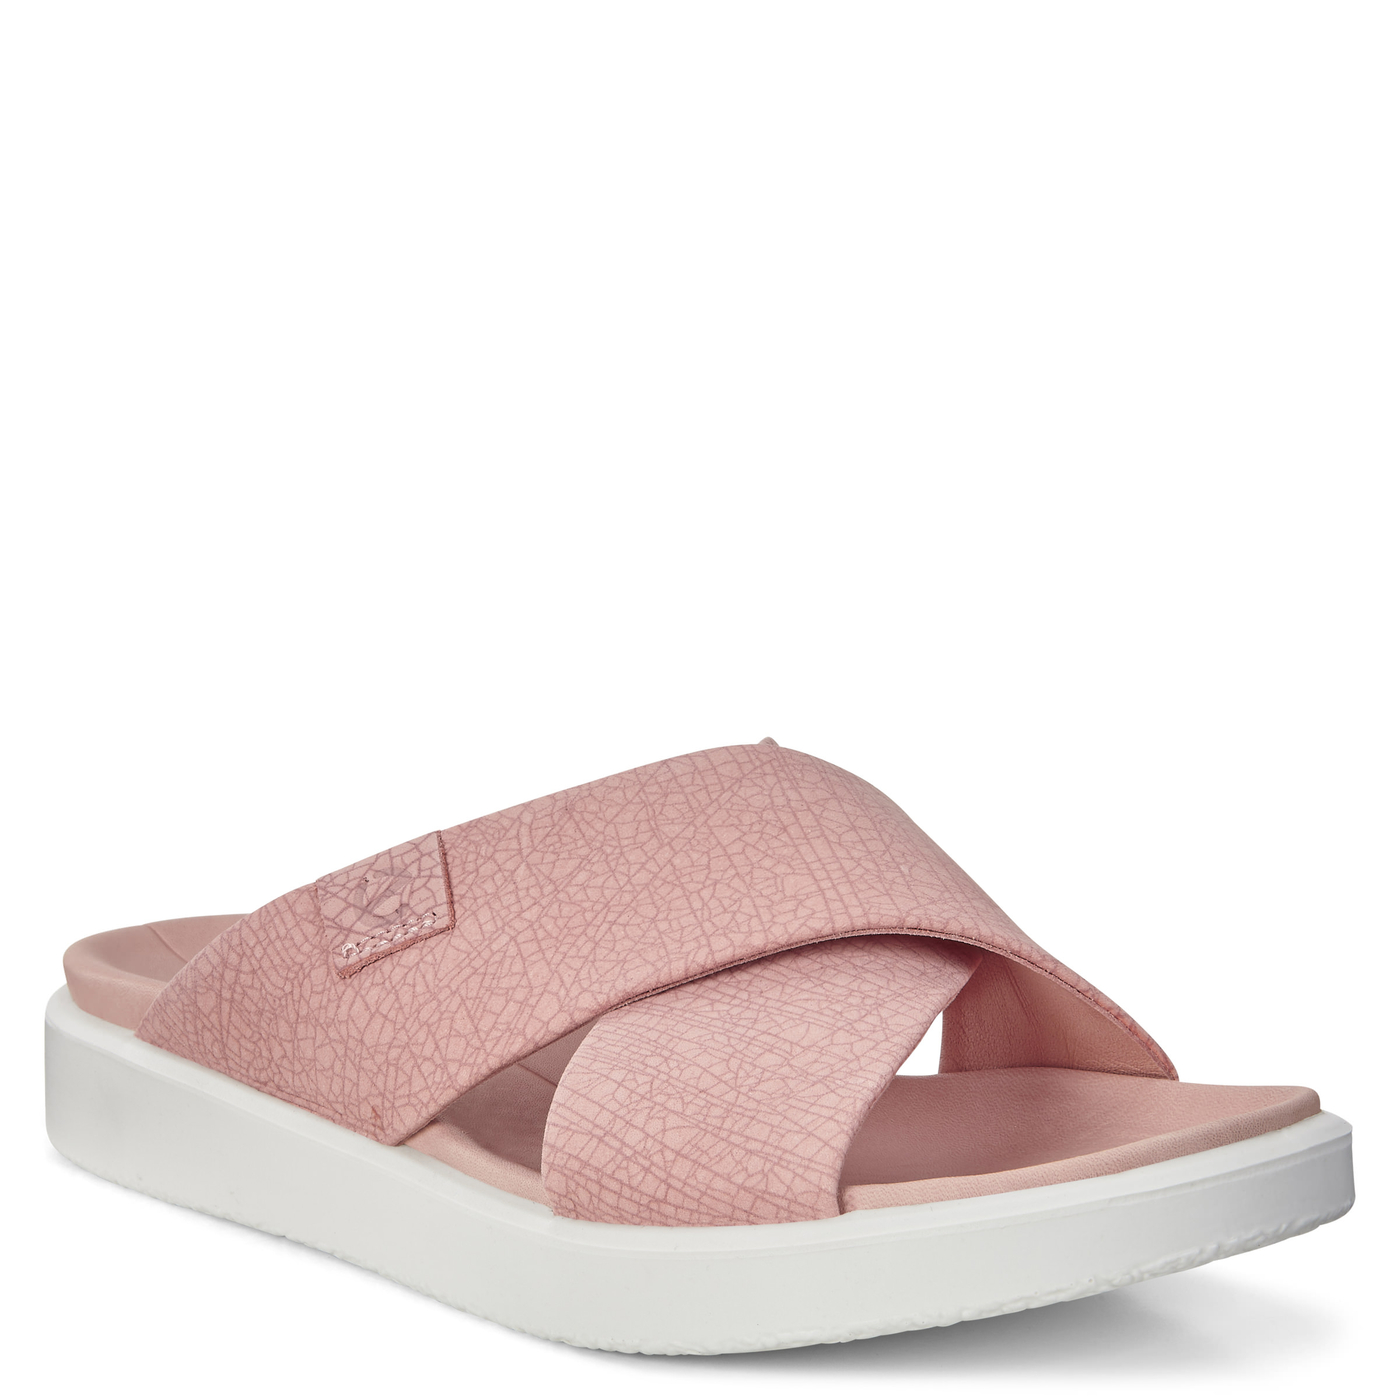 ECCO FLOWT LX Women's Slide Sandal